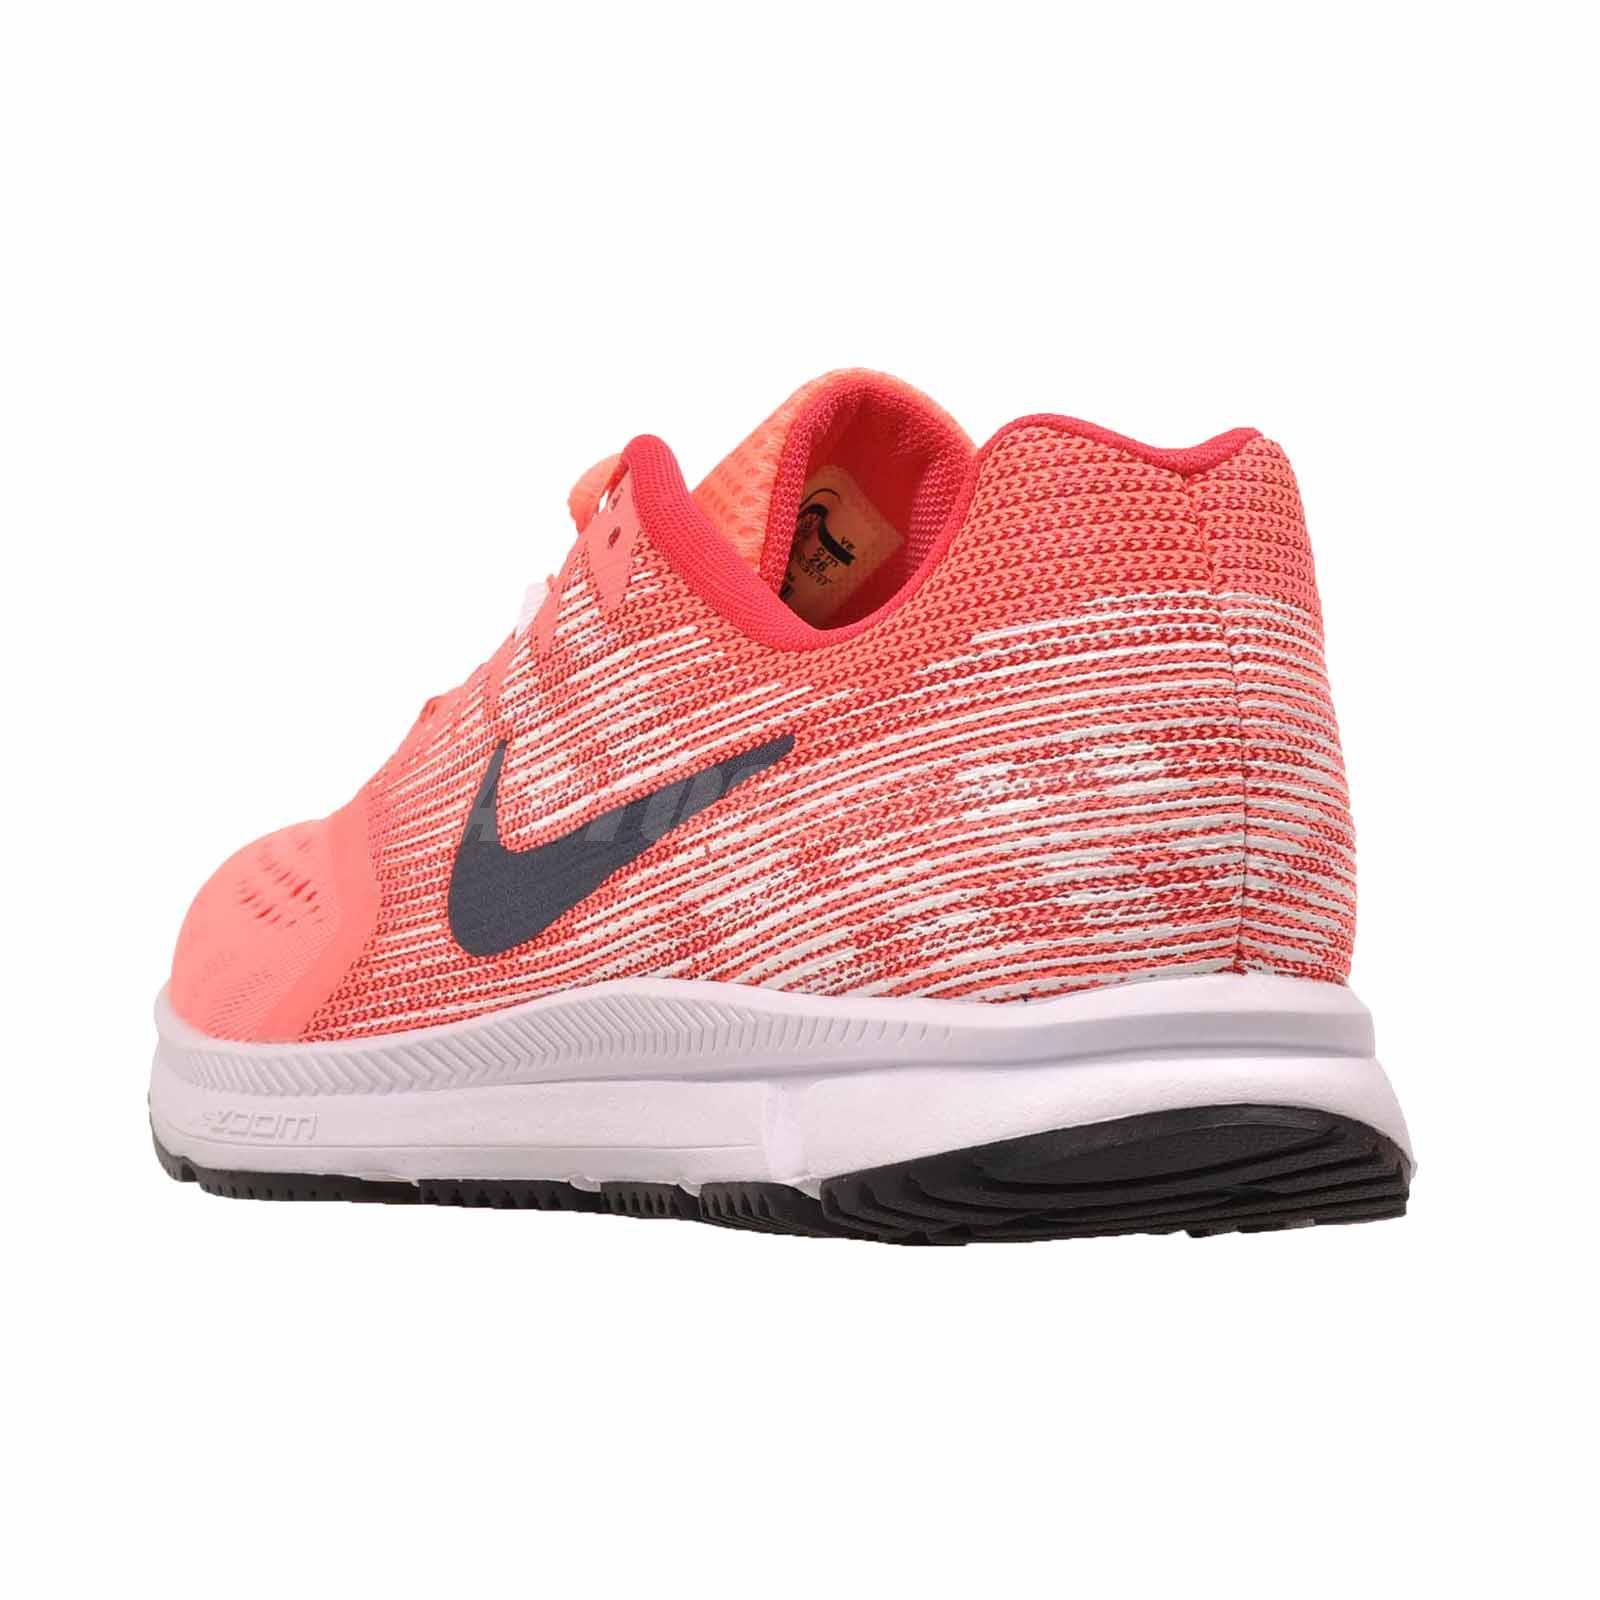 c0eeb0aa6ae7 Nike Wmns Zoom Span 2 Running Womens Shoes NWOB Lava Glow 909007-600 ...